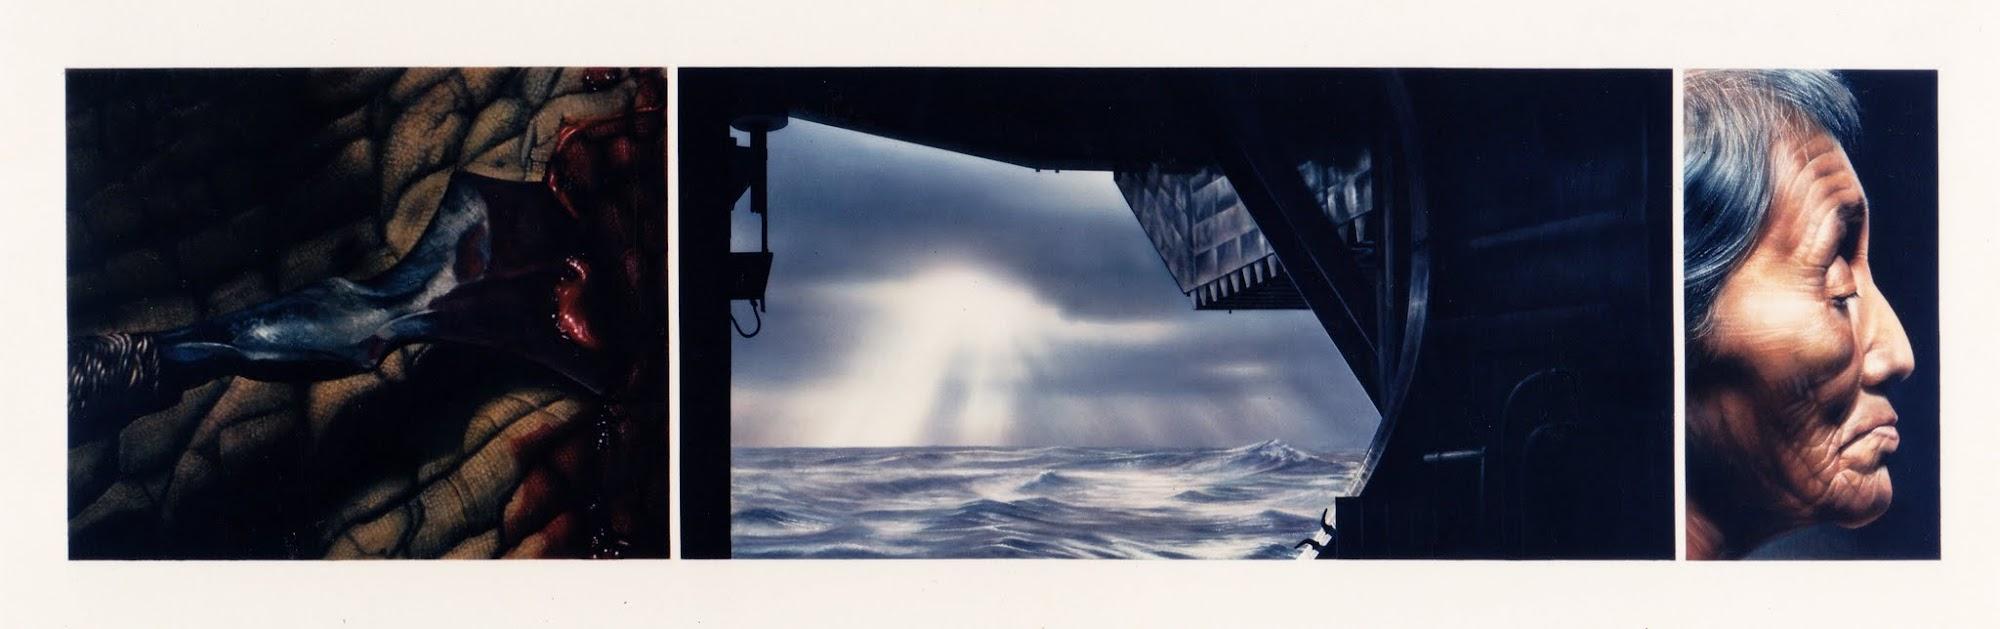 Zeitkeim   1994   Aquarell   45 x 171 cm